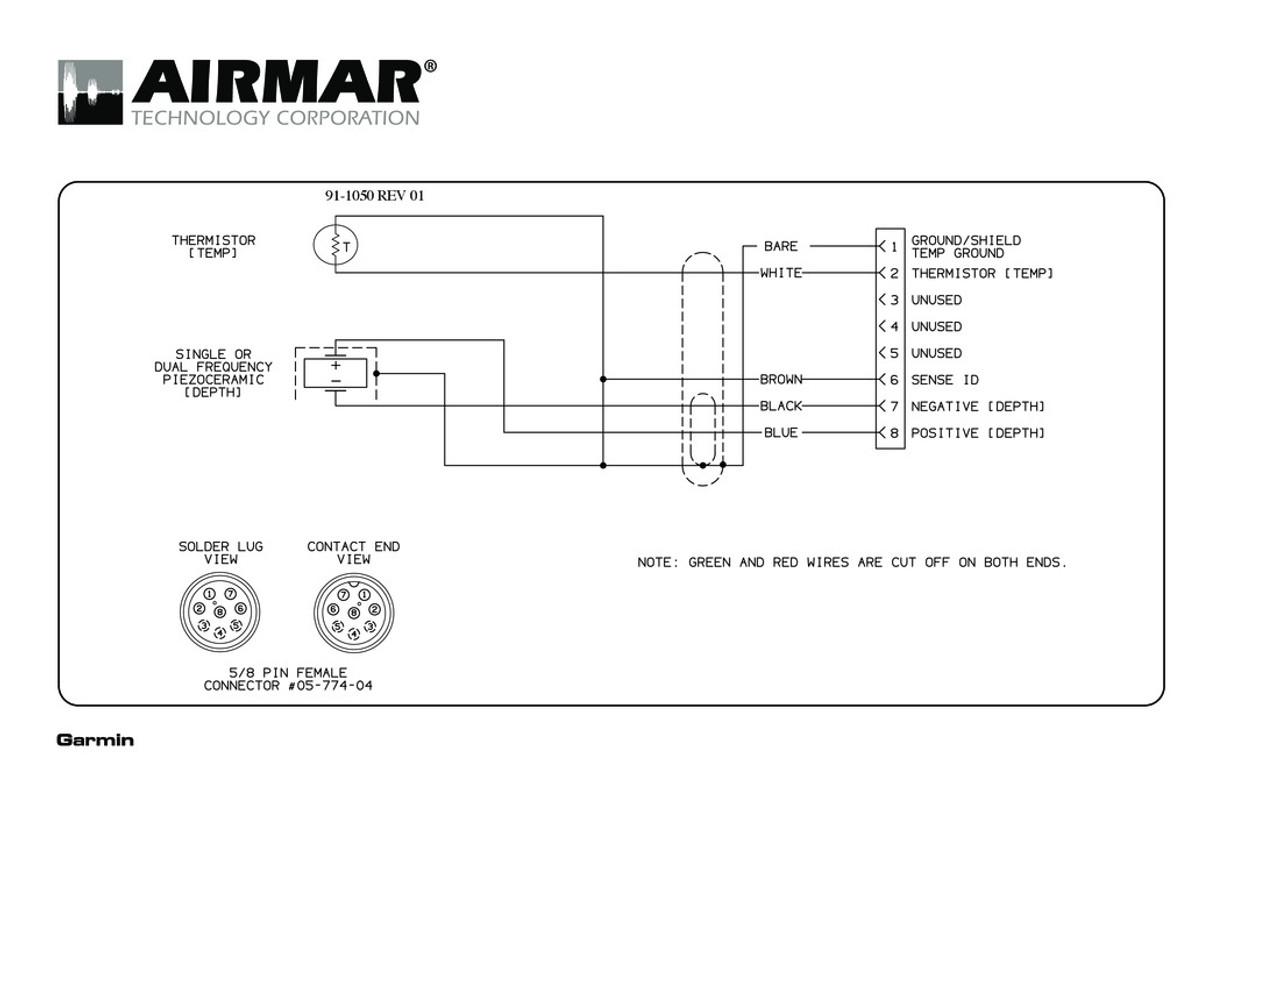 medium resolution of airmar wiring diagram garmin p319 8 pin d t blue bottle marine rh bluebottlemarine com 7 pin wiring diagram trailer 7 pin wiring diagram pdf